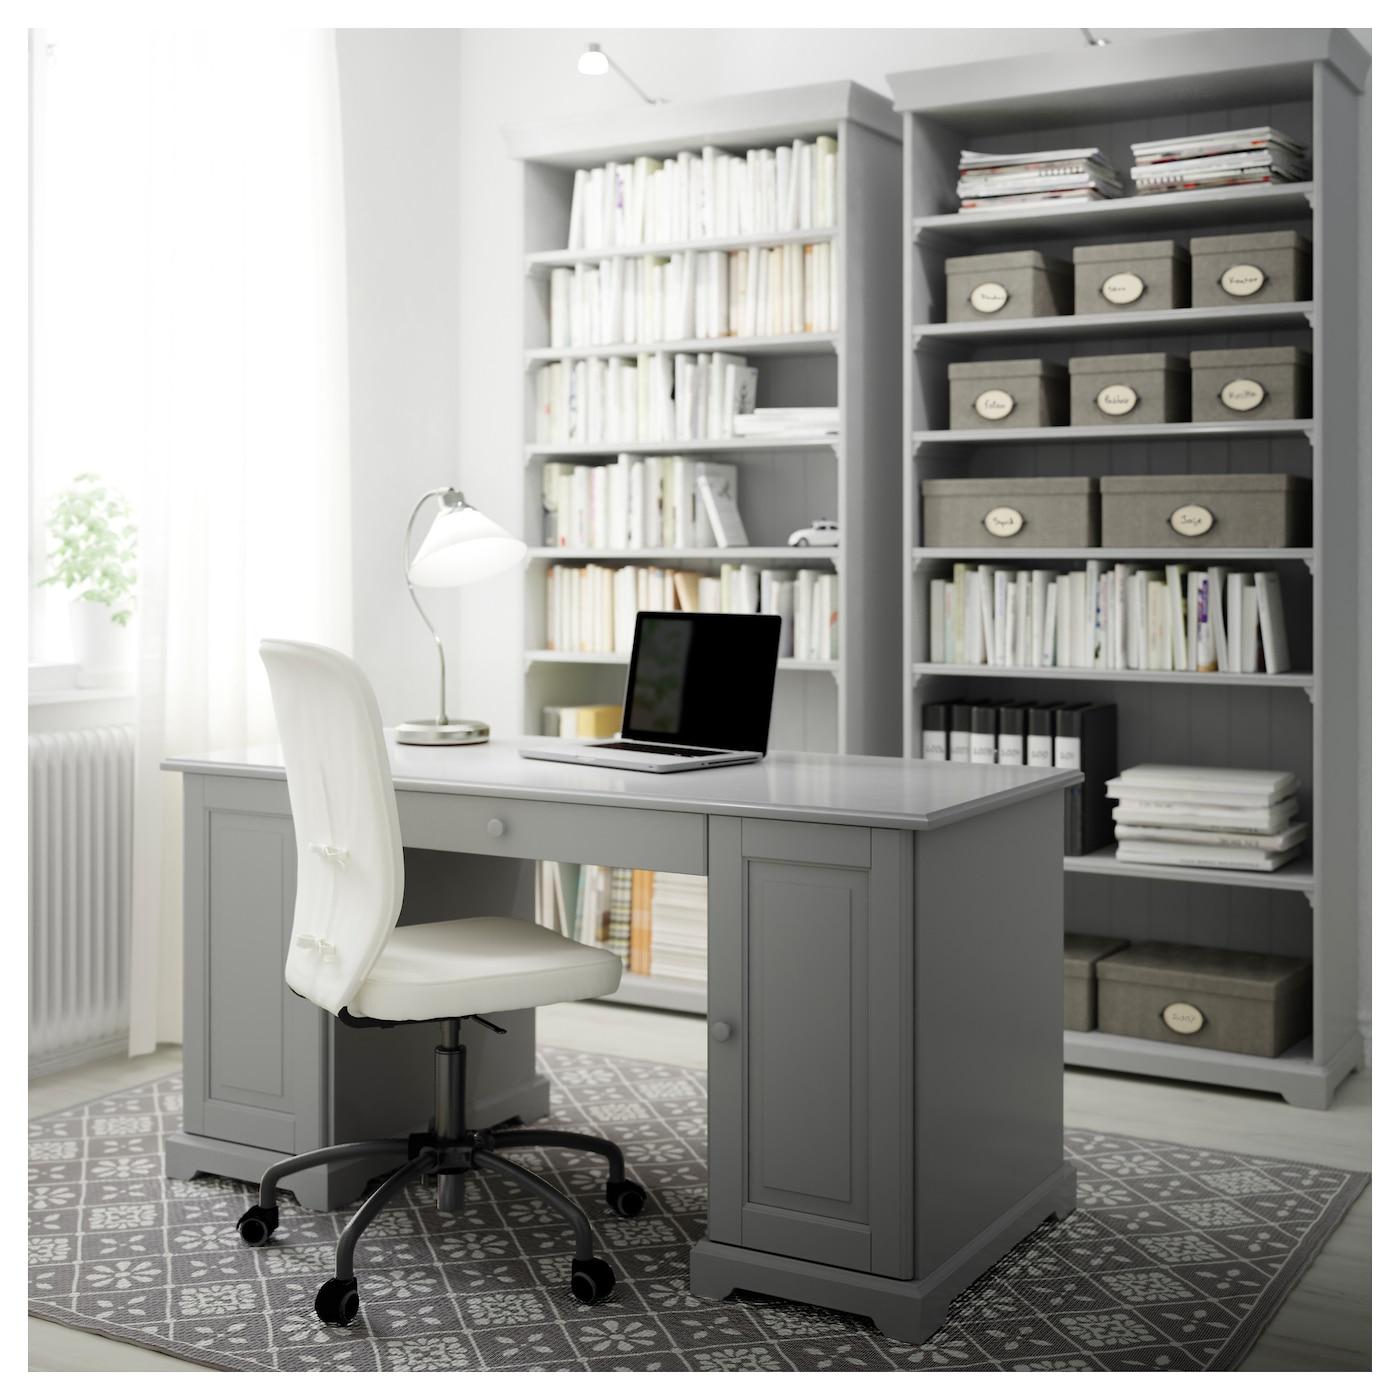 Liatorp bookcase grey 96x214 cm ikea for Ikea furniture office